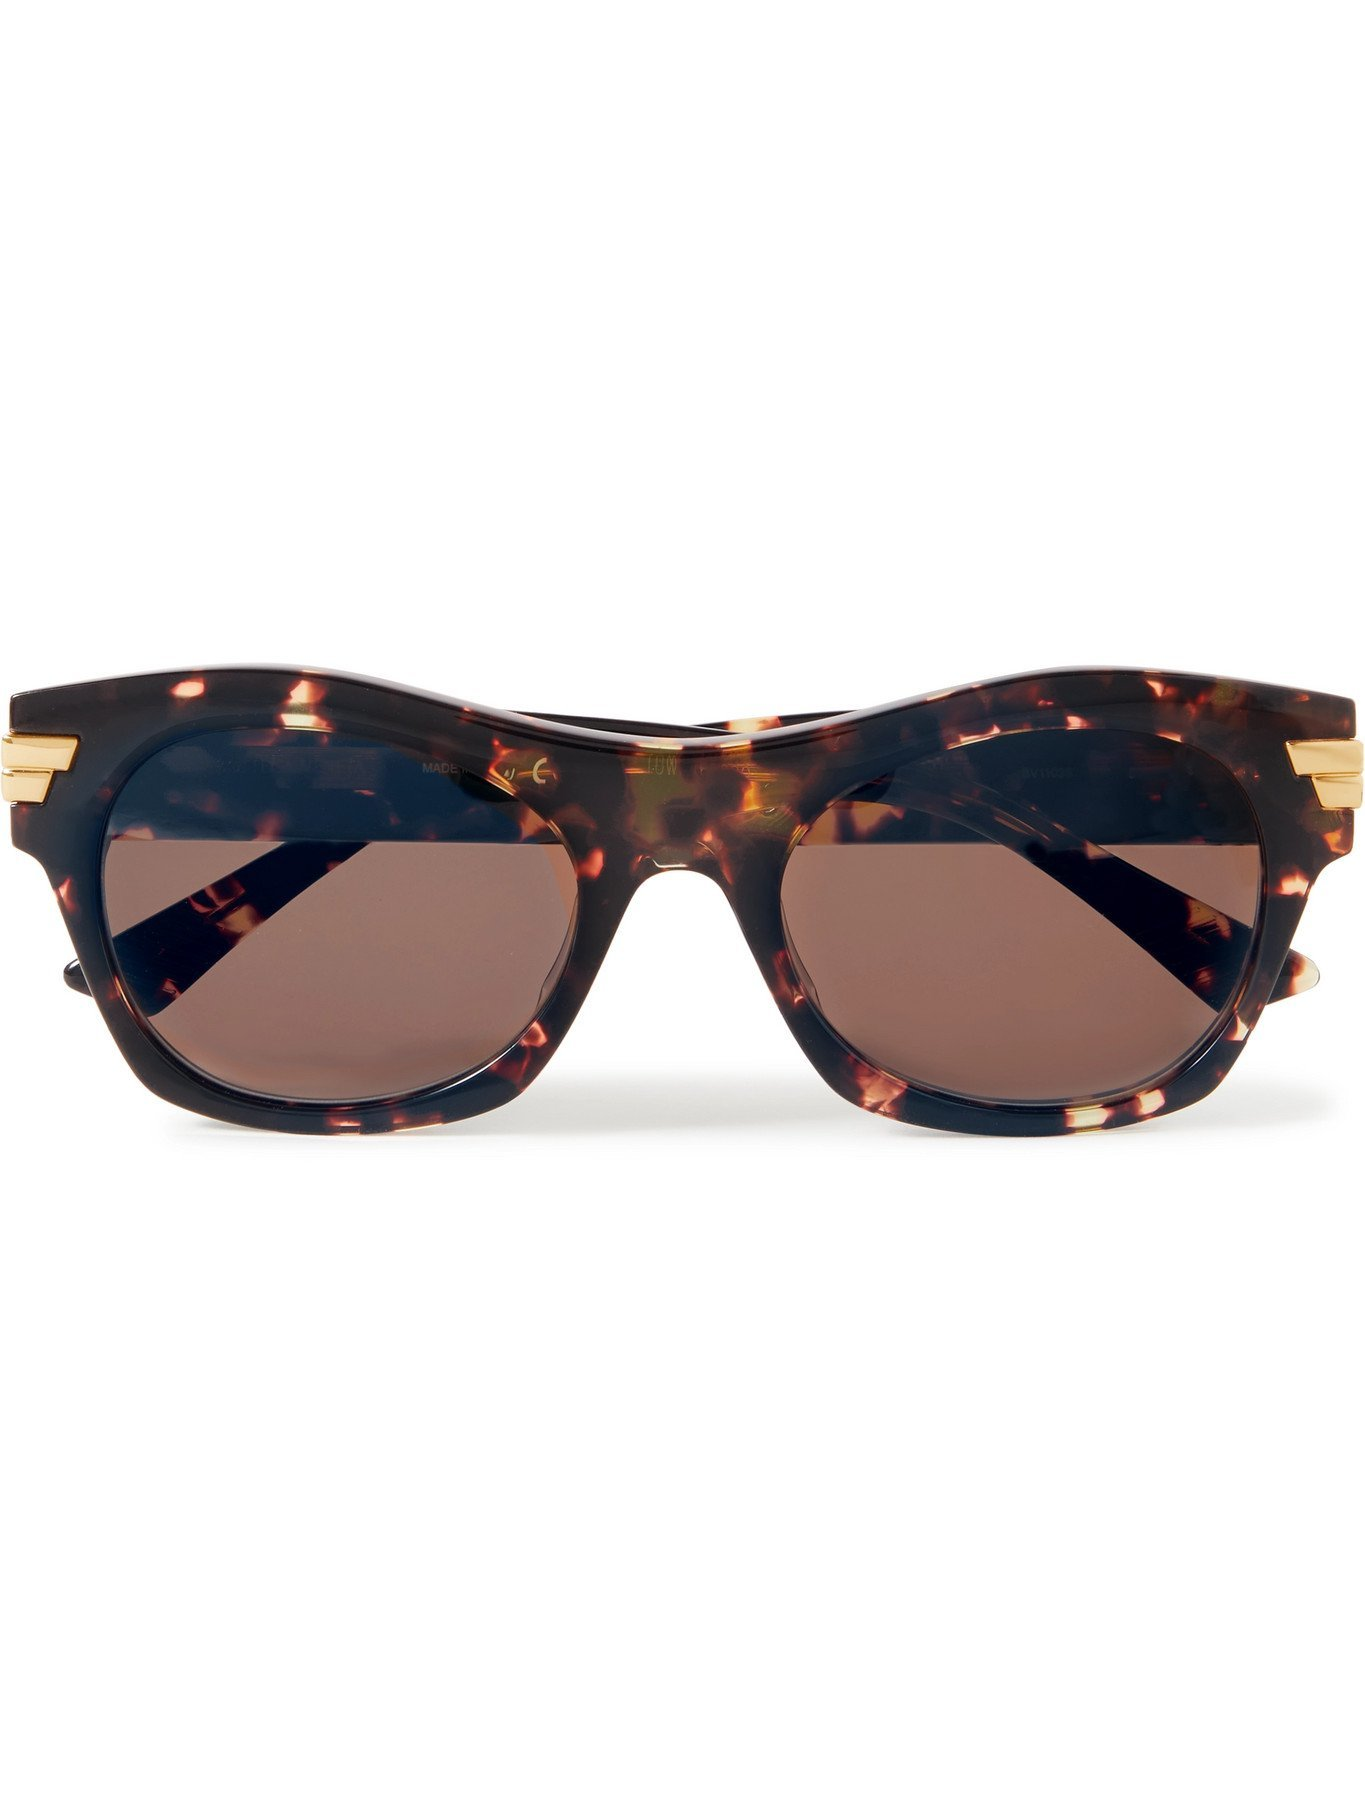 Photo: BOTTEGA VENETA - D-Frame Acetate Sunglasses - Brown